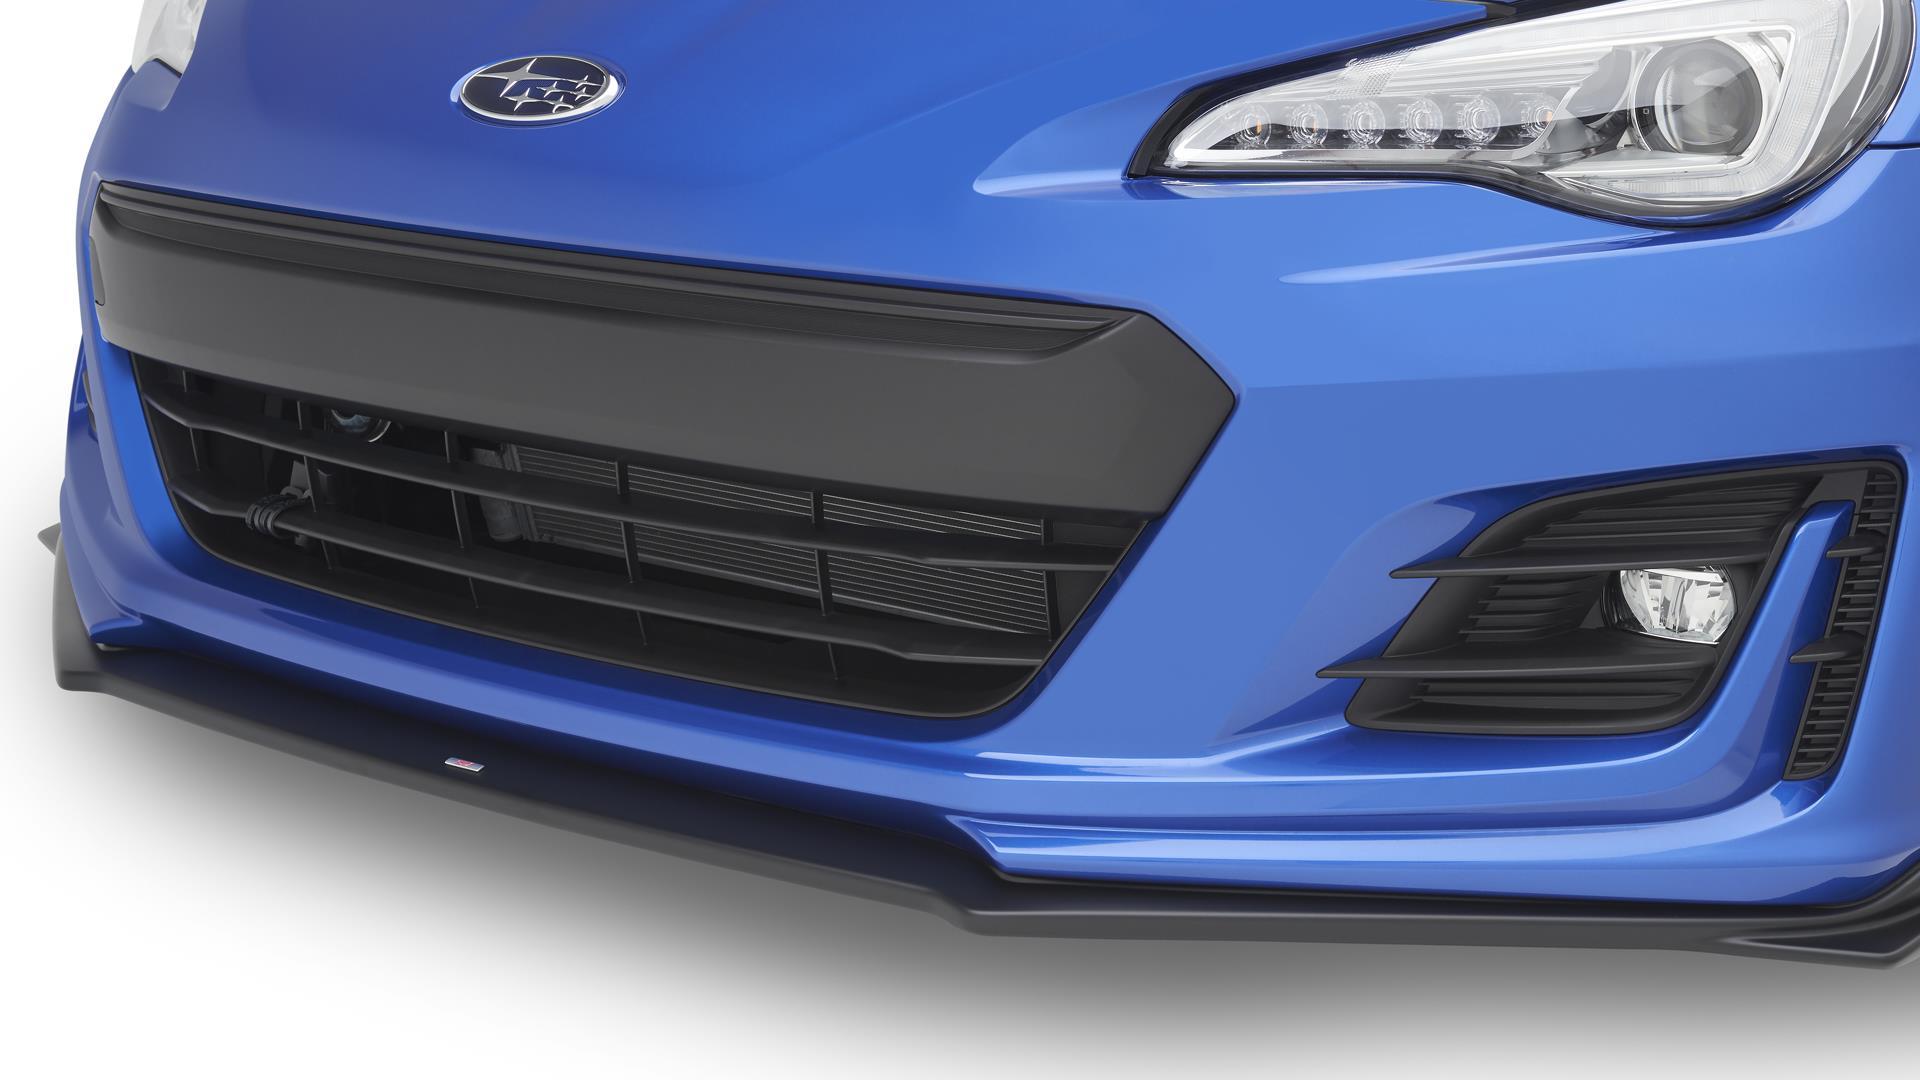 Subaru Crosstrek Sti Wheels >> Shop Genuine 2017 Subaru BRZ Accessories | Subaru of America